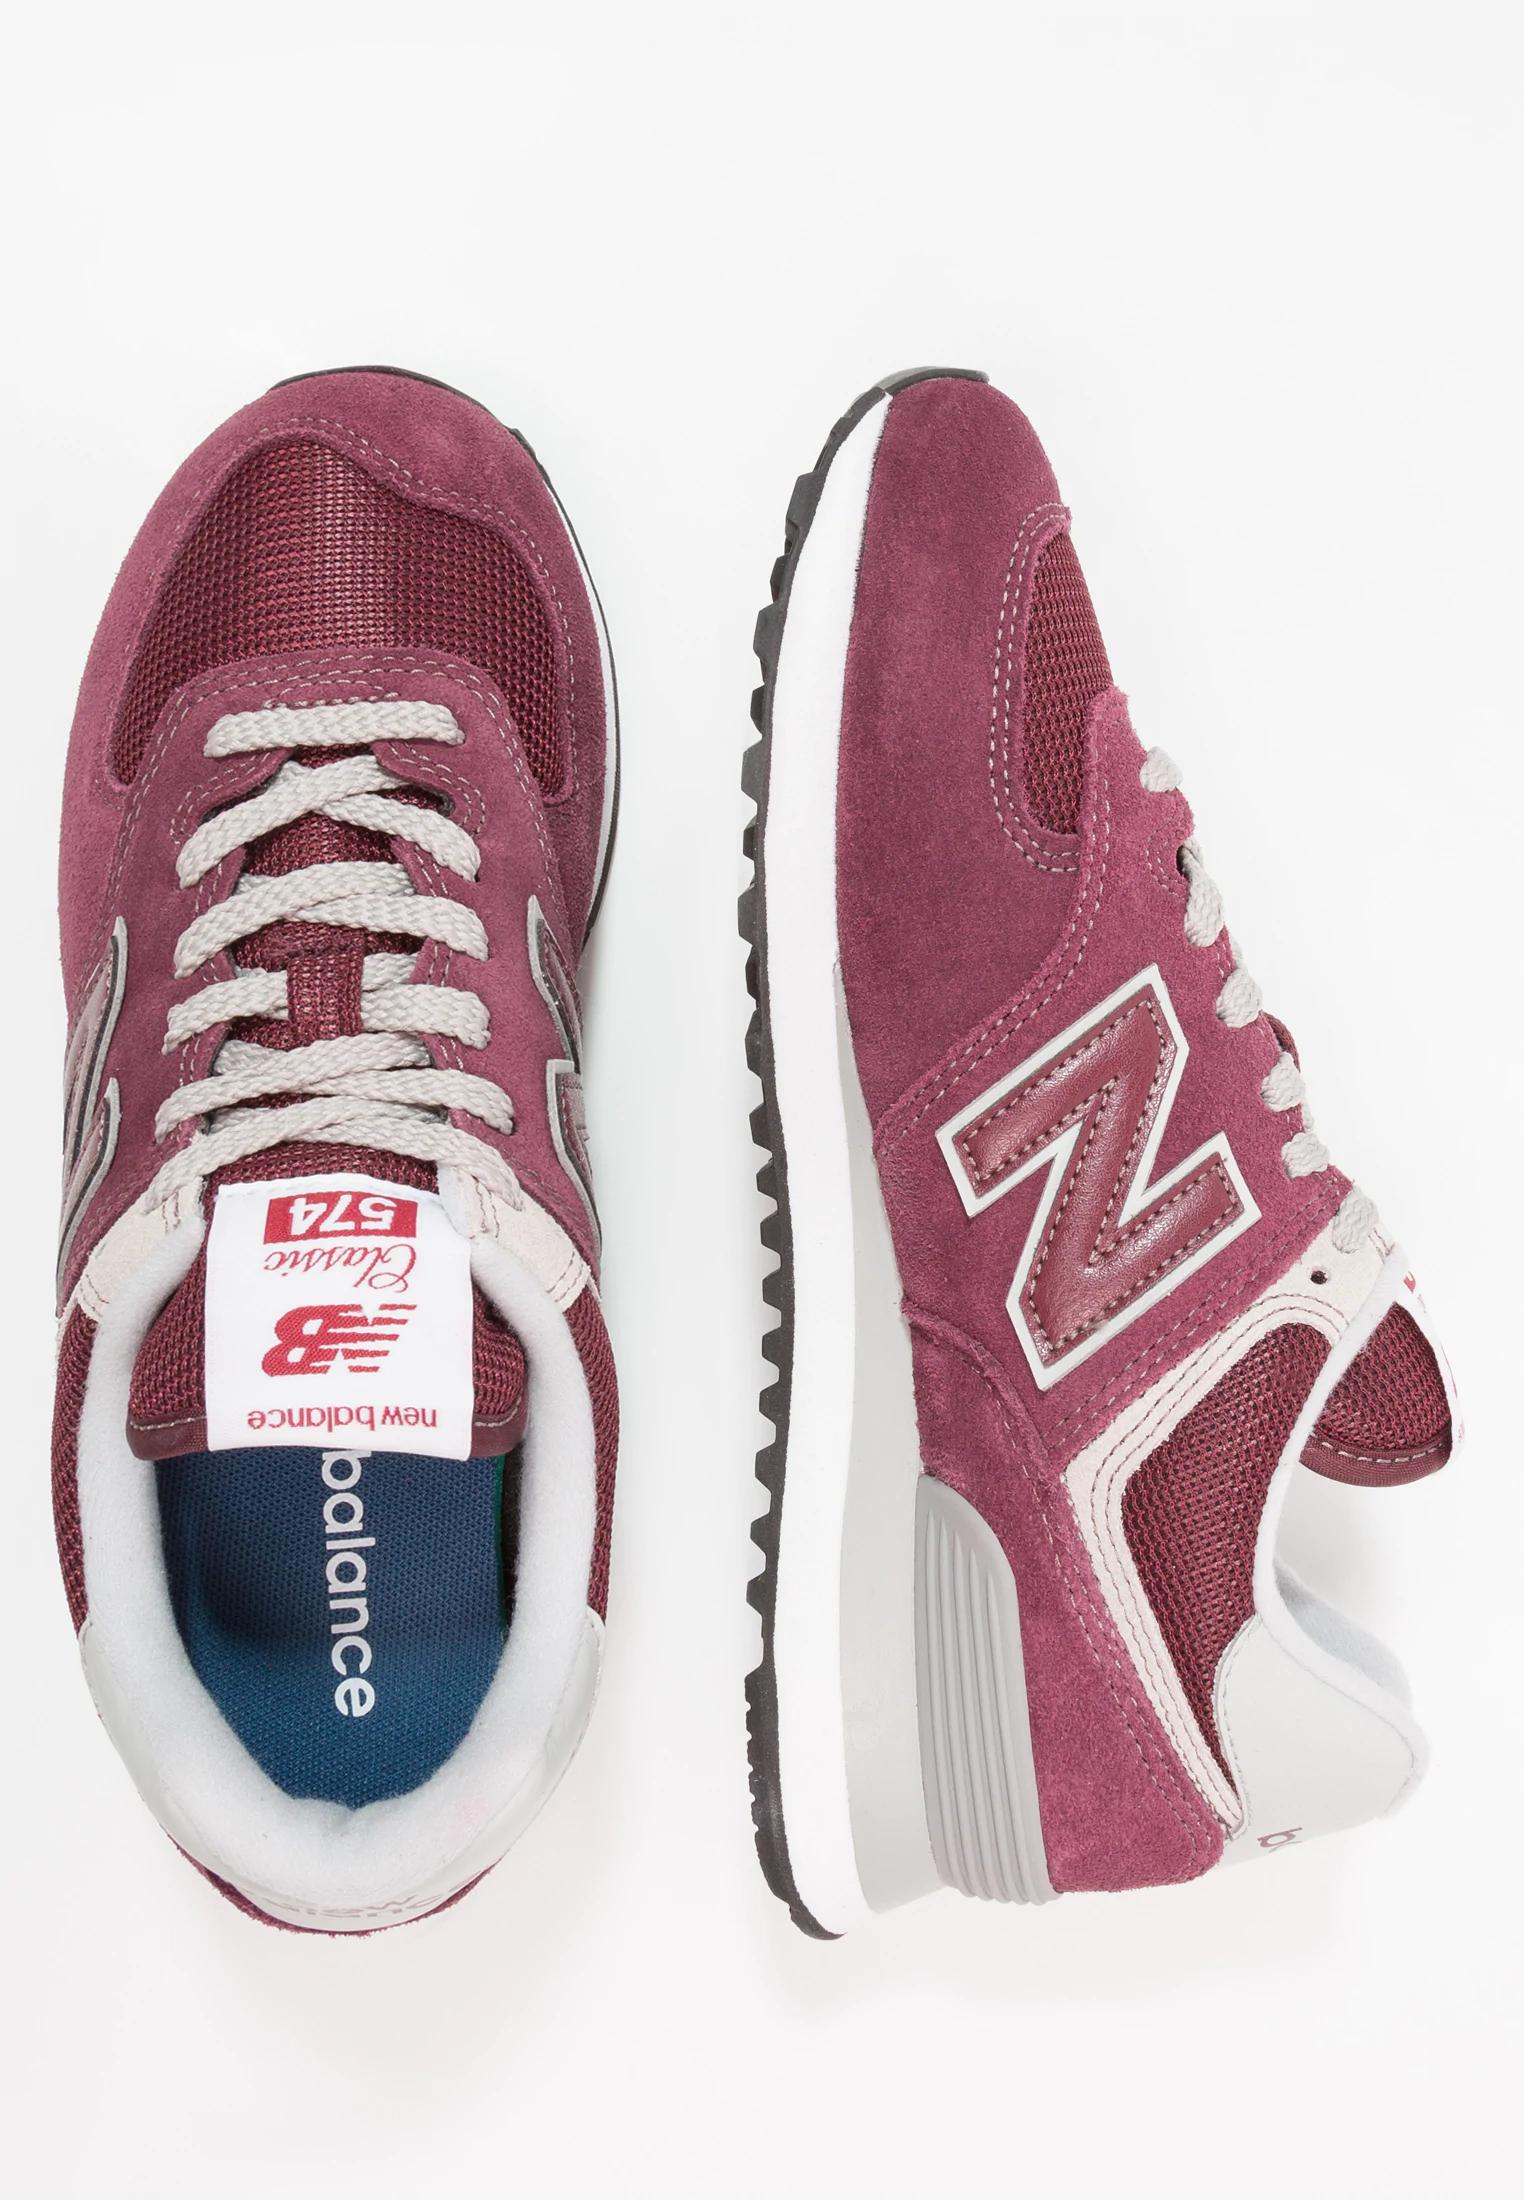 New Balance 574 Trainers £21.60 Zalando